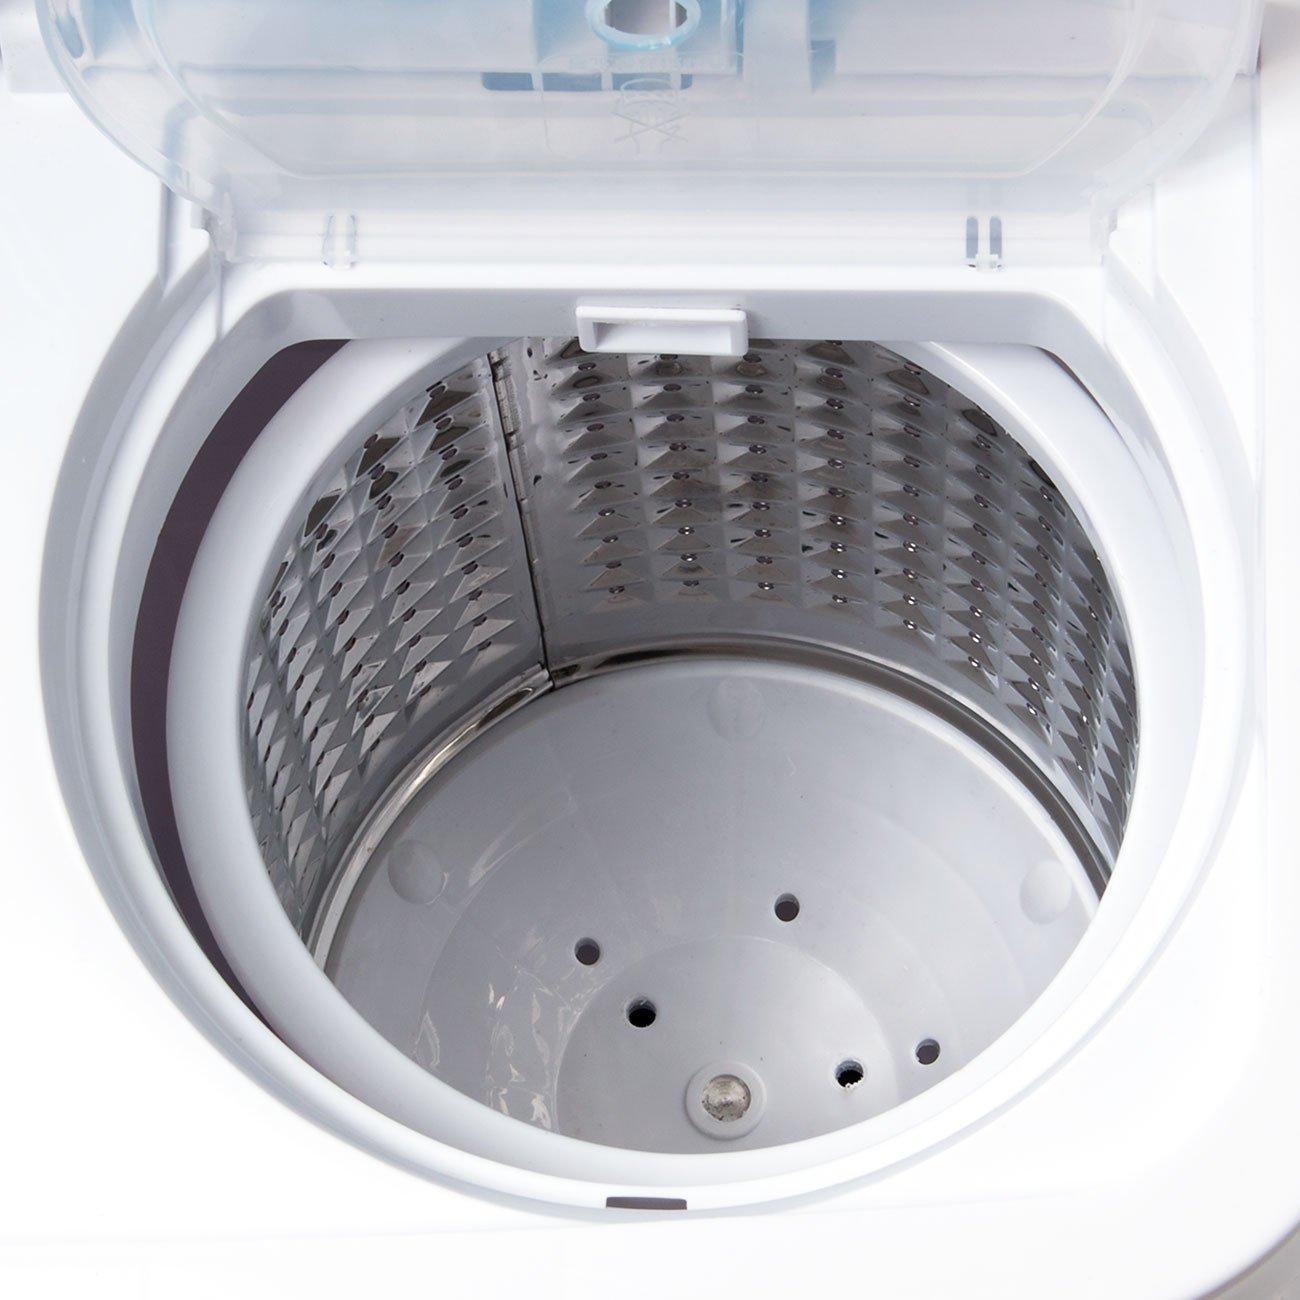 Mini Clothes Washer Amazoncom Della Mini Washing Machine Portable Compact Washer And